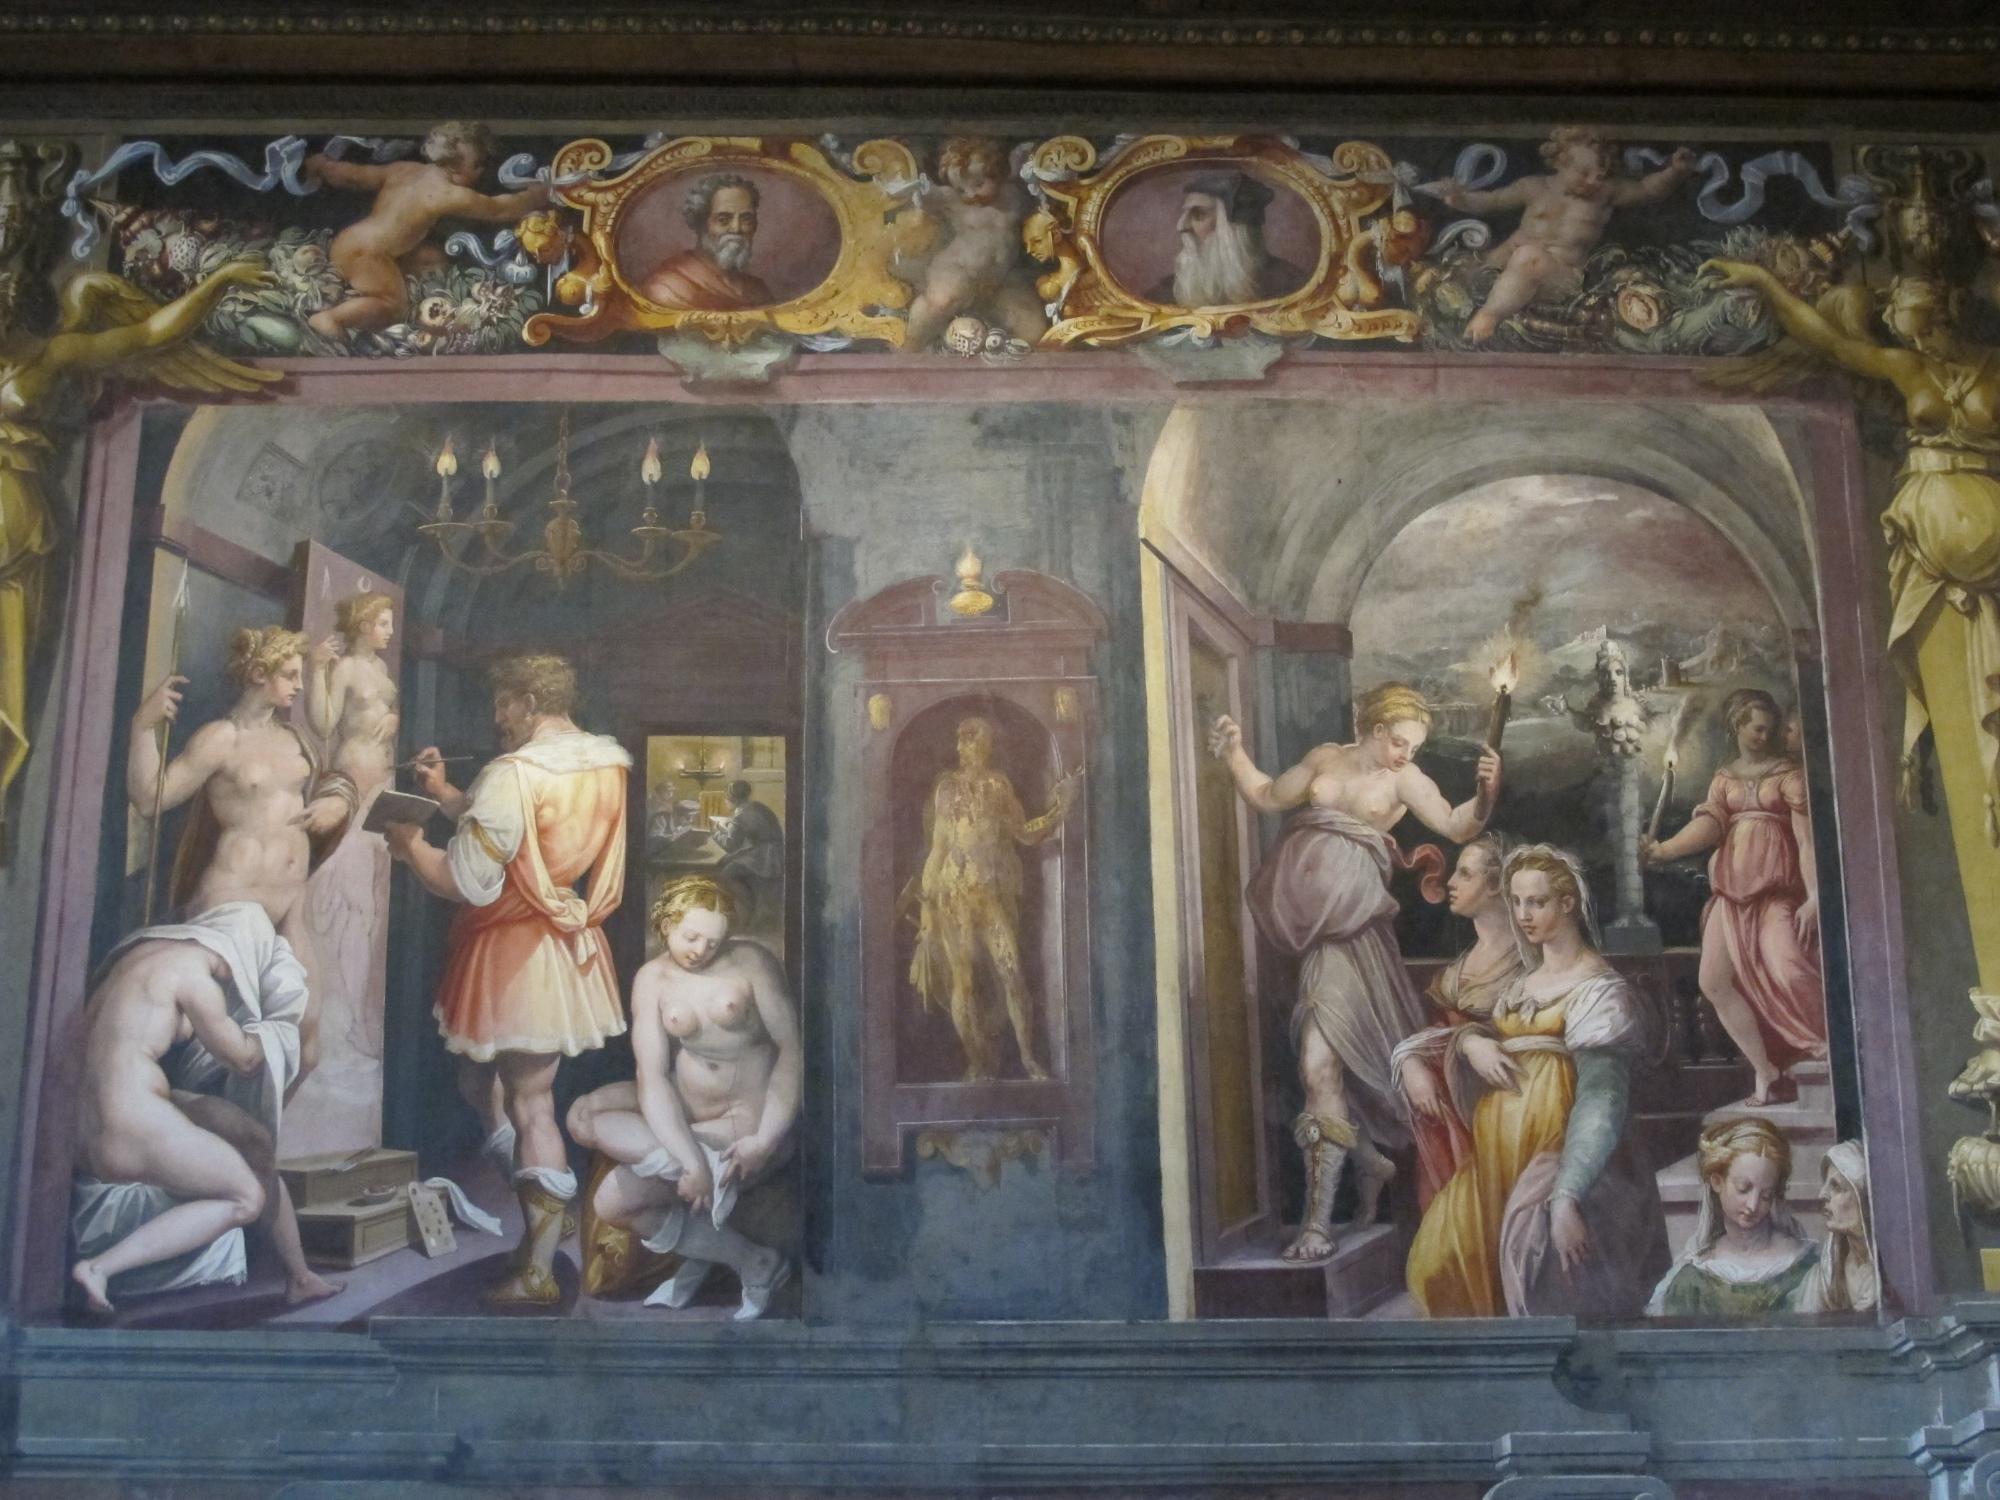 Casa vasari in florence visit tuscany - Casa del giunco firenze ...